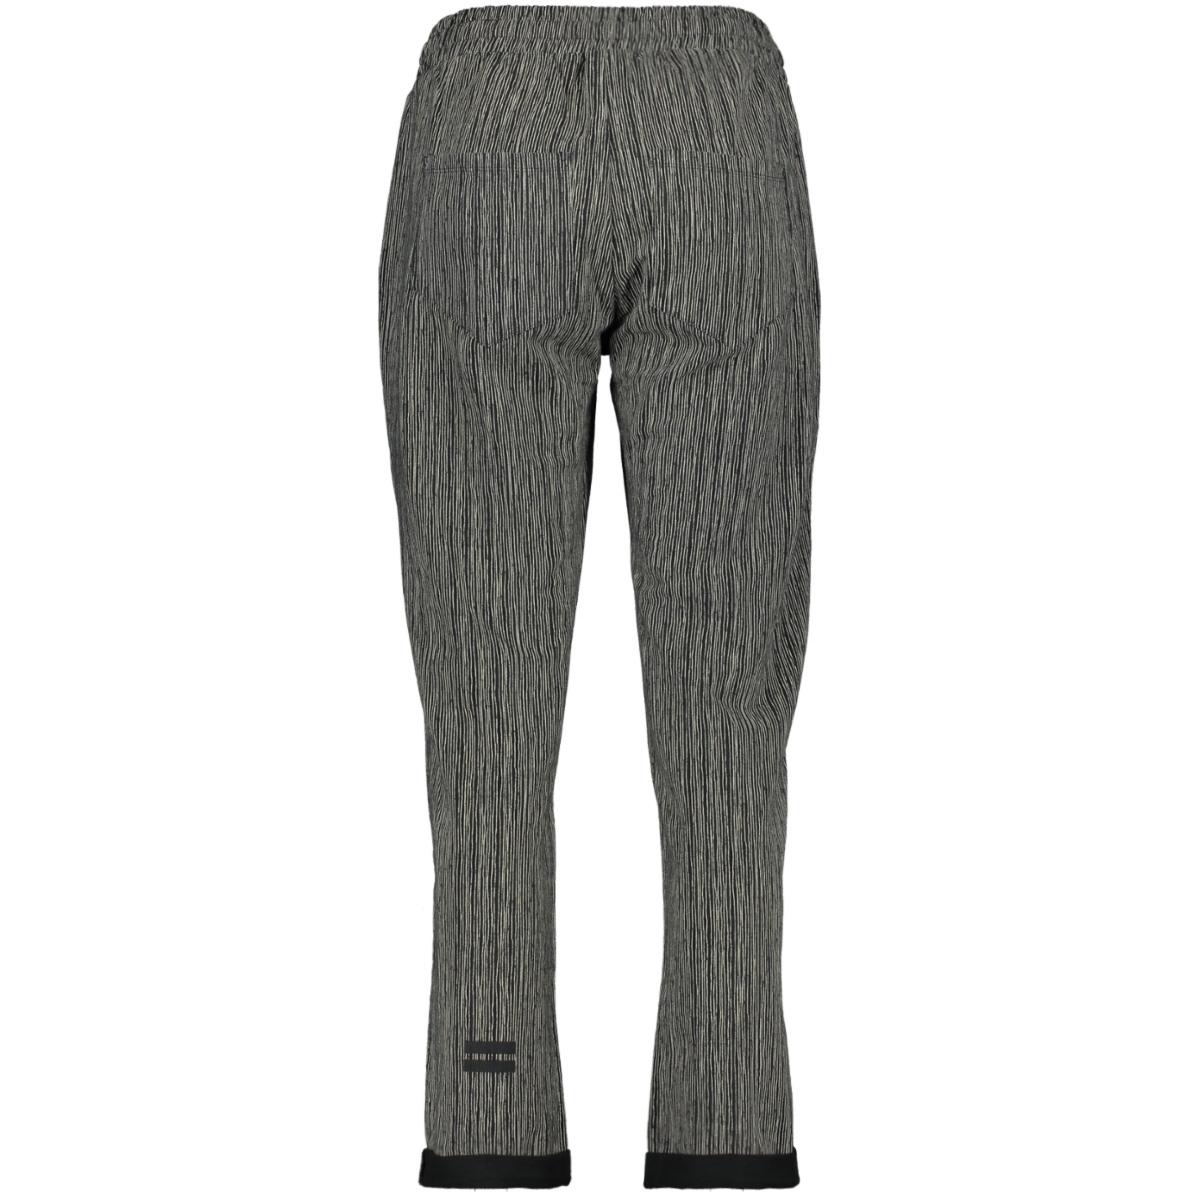 jogger thin stripe 20 009 9101 10 days broek charcoal